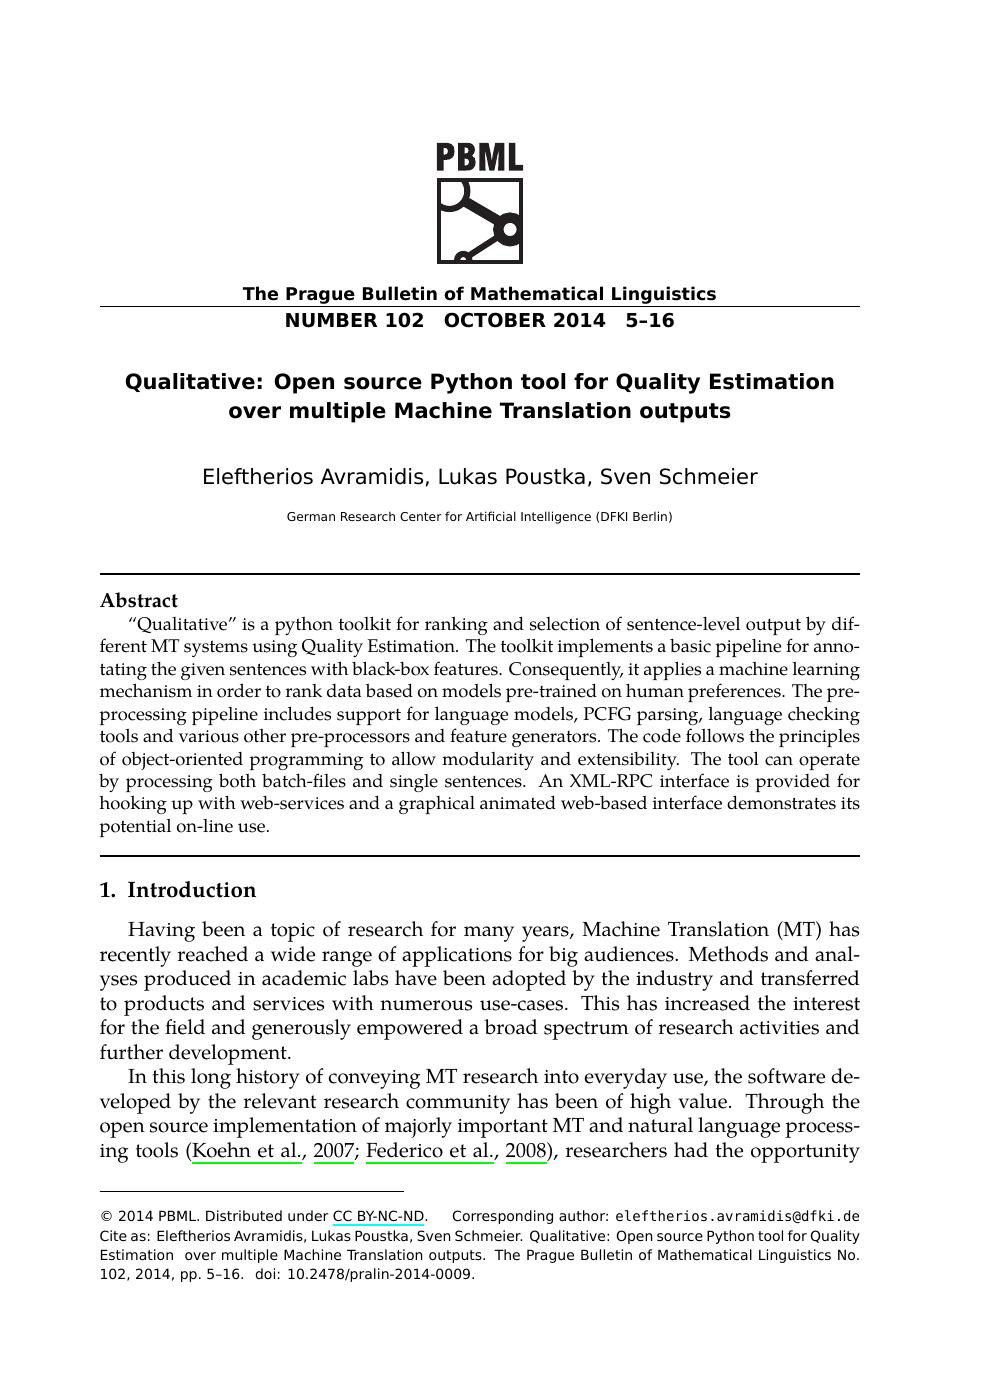 Qualitative: Open Source Python Tool for Quality Estimation over